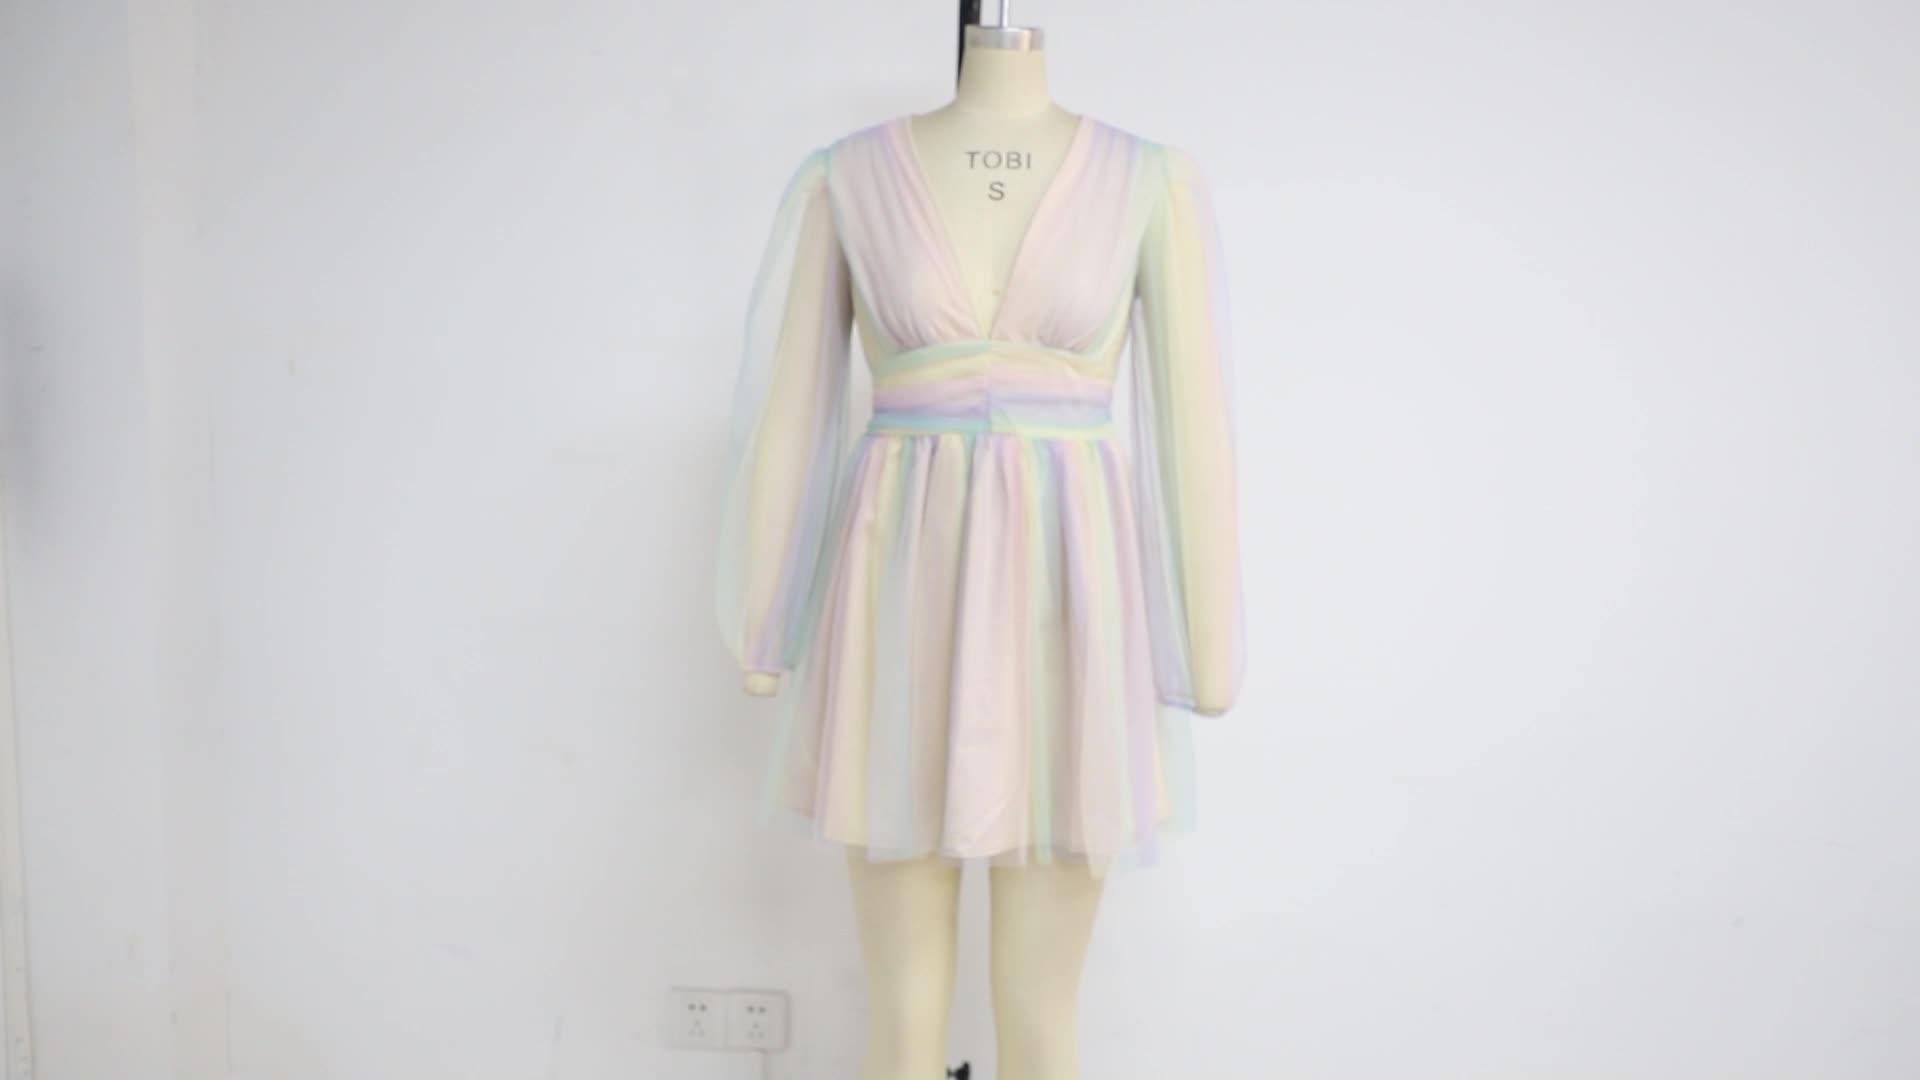 Weixin Deep V Iridescent High Waist Layered Translucent Womens Clothing Custom Design Mini Dresses